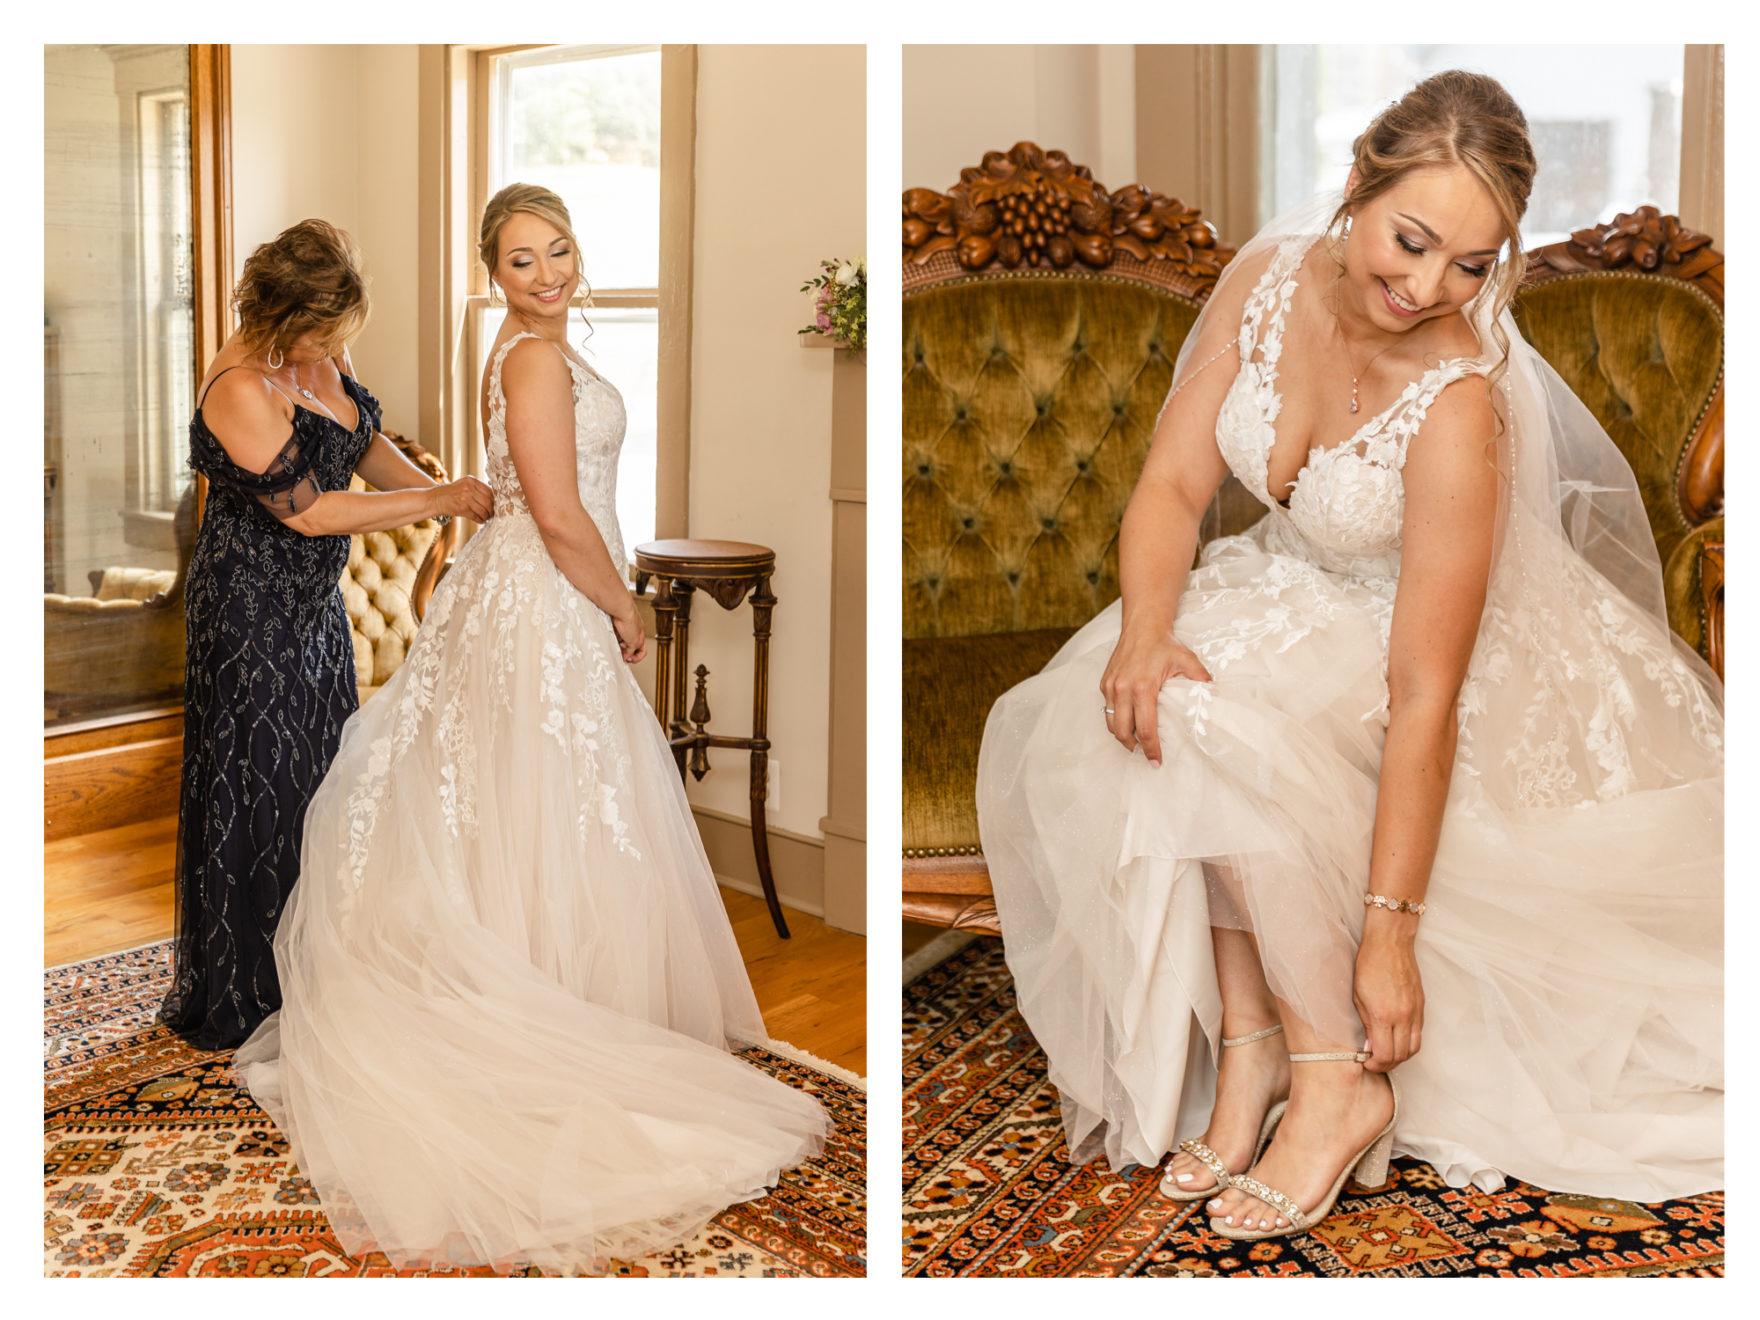 Summer Wedding Stone Ridge Hollow June Wedding Lavender dresses wedding dress